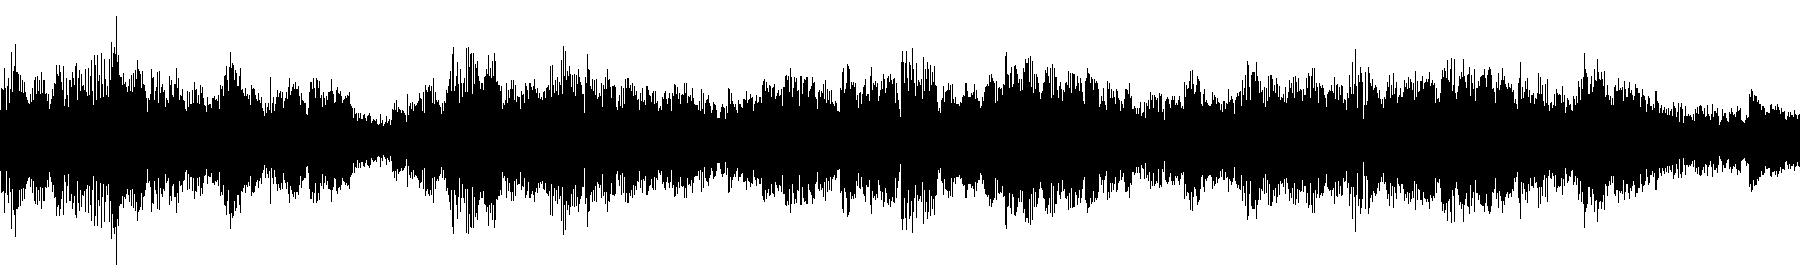 wurly emin 125bpm